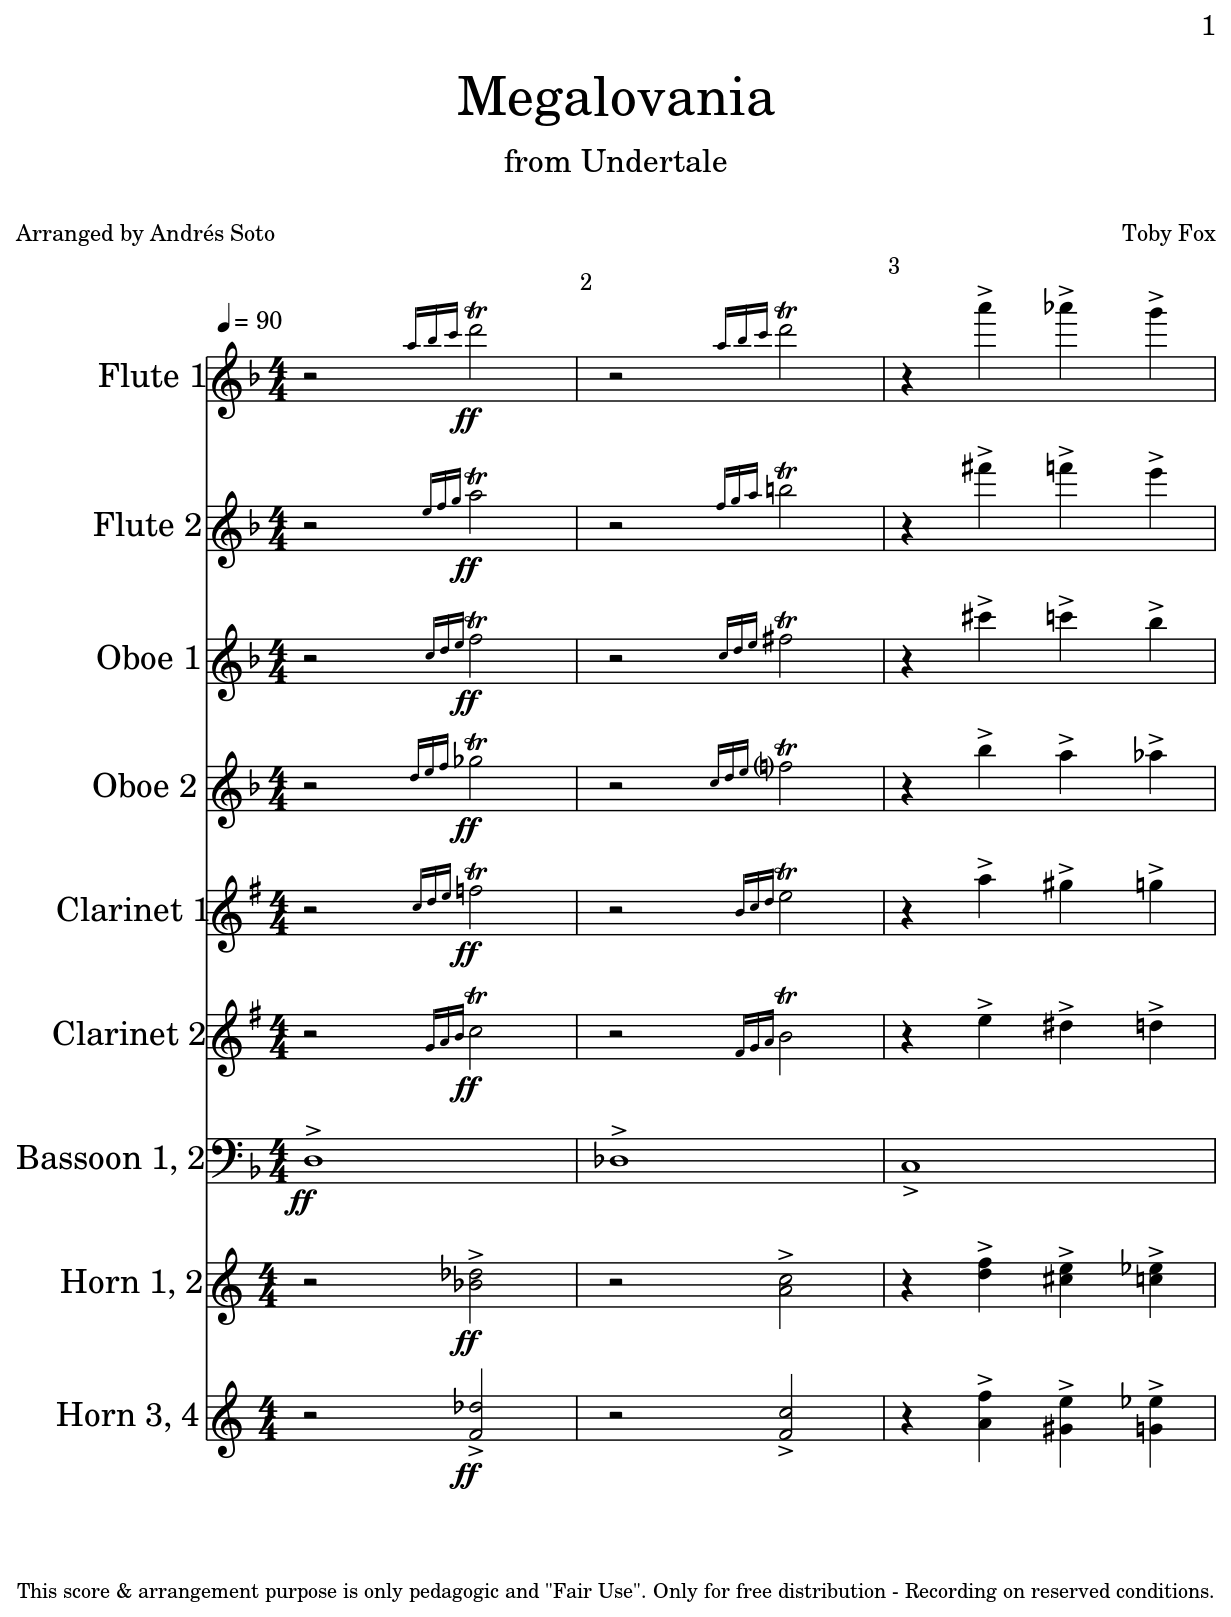 Megalovania Sheet Music For Flute Oboe Clarinet Bassoon Horn